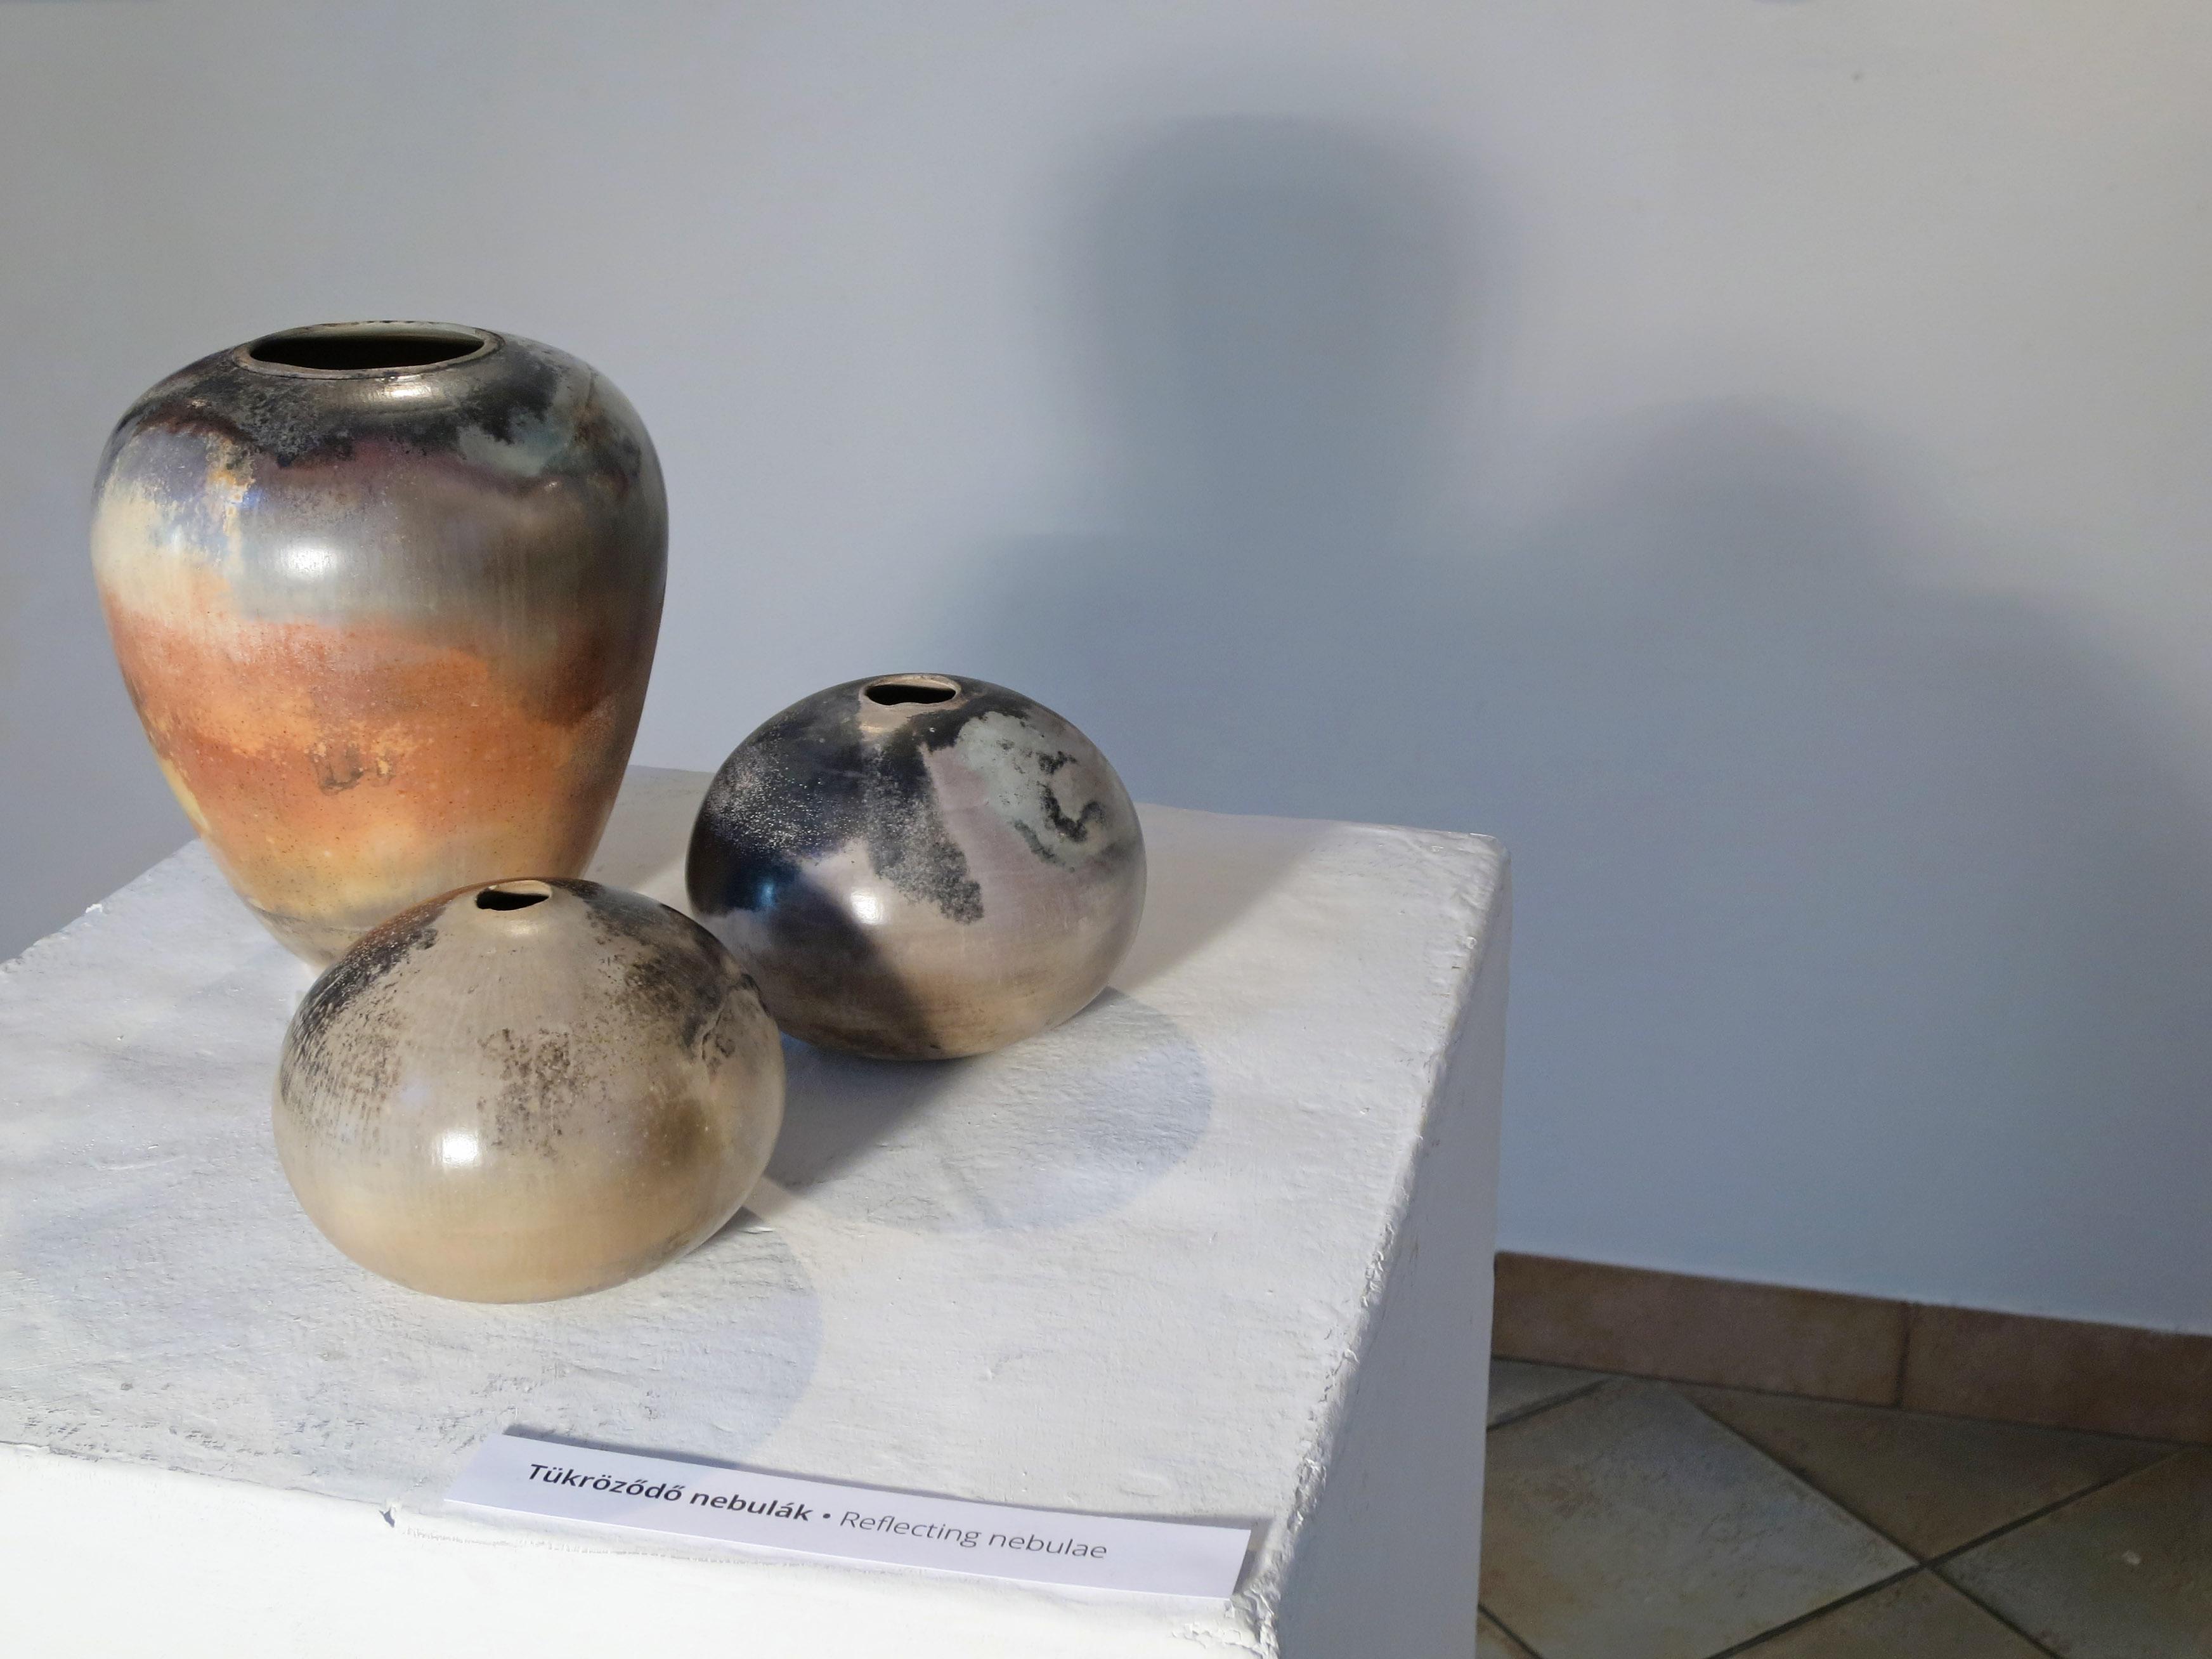 Reflecting Nebulae - Tangible Universes: Solo Exhibition with Whispering Globes